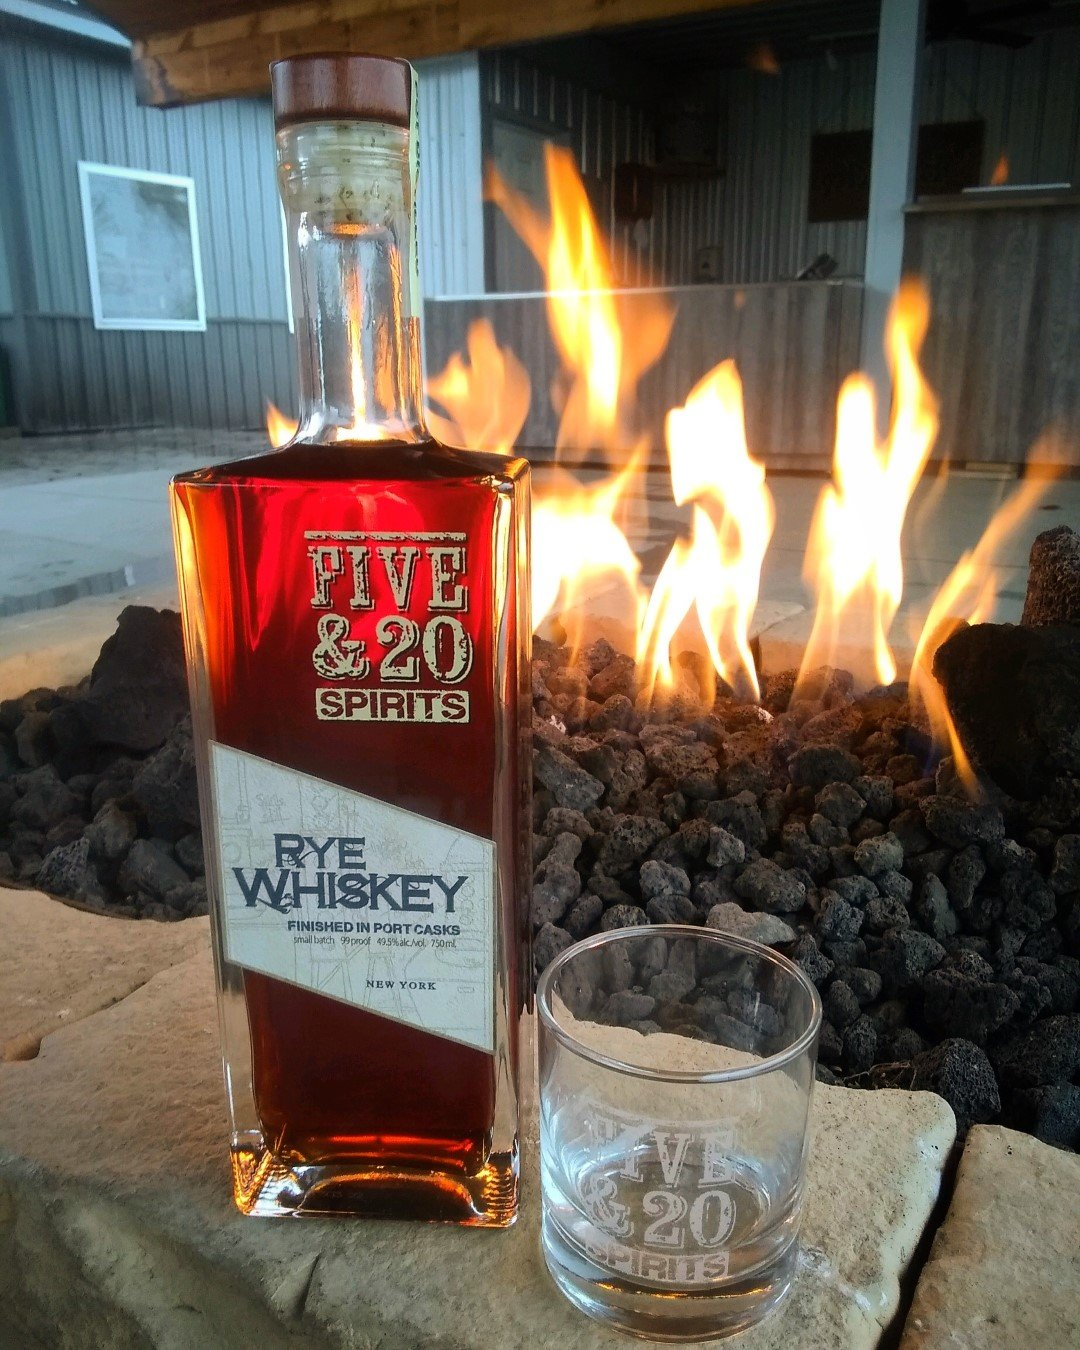 Five & 20 Spirits Rye Whiskey Finished in Port Casks